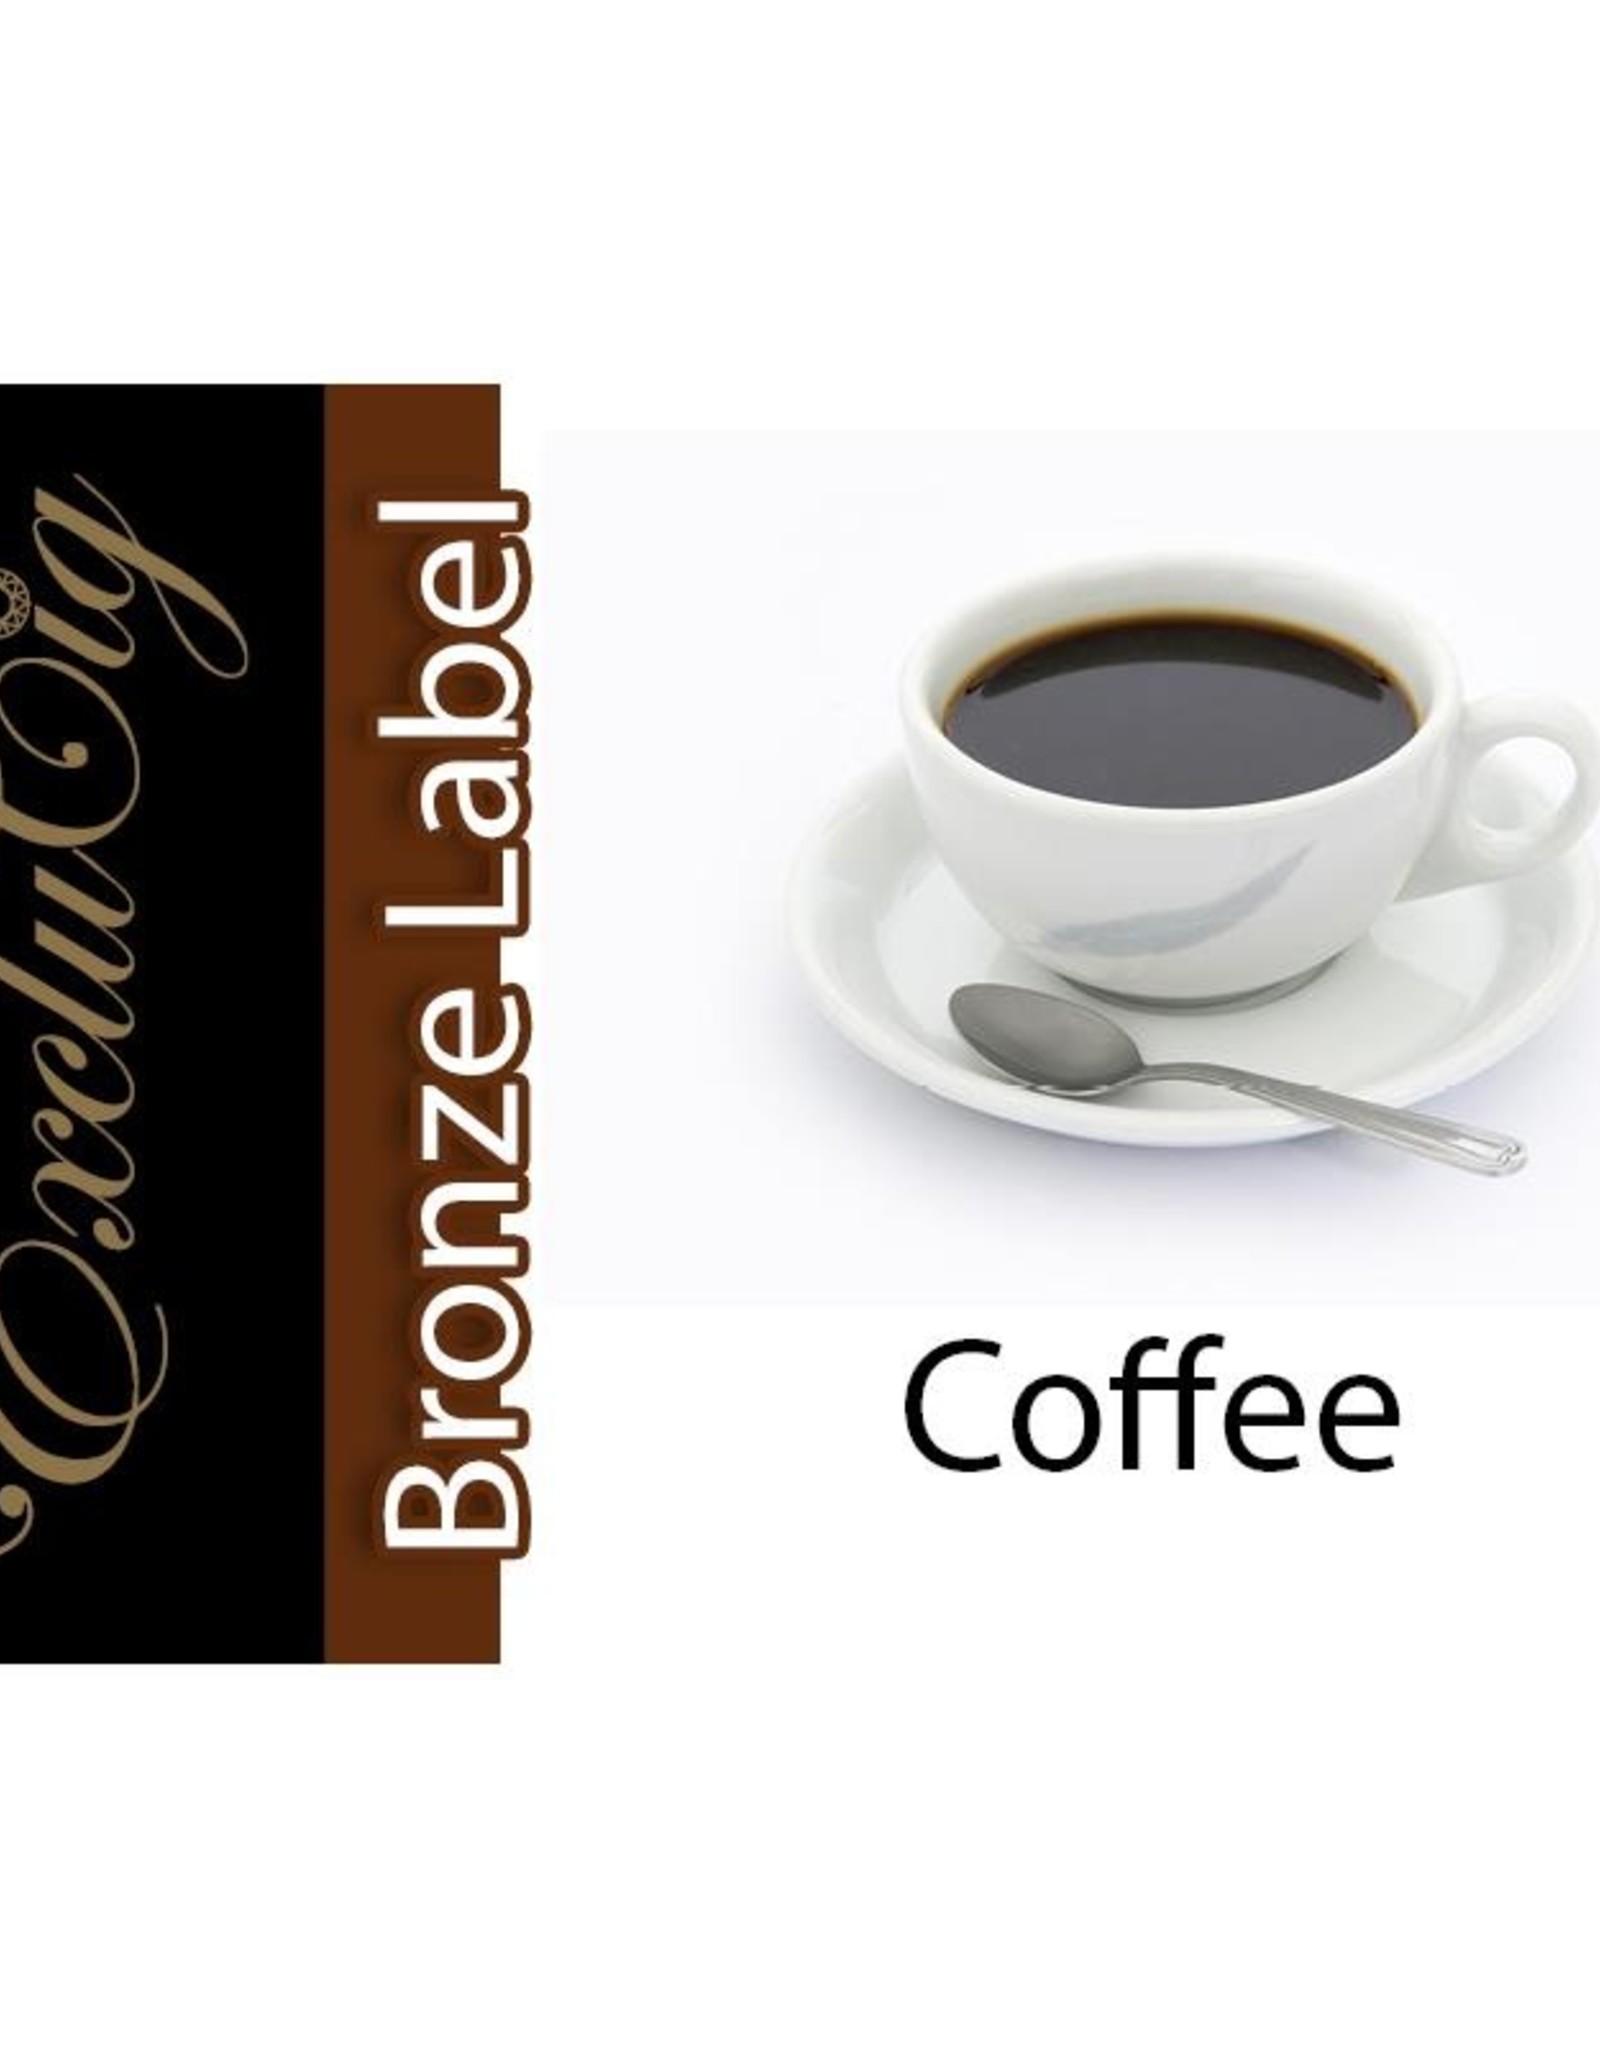 Exclucig Exclucig Bronze Label E-liquid Coffee 18 mg Nicotine